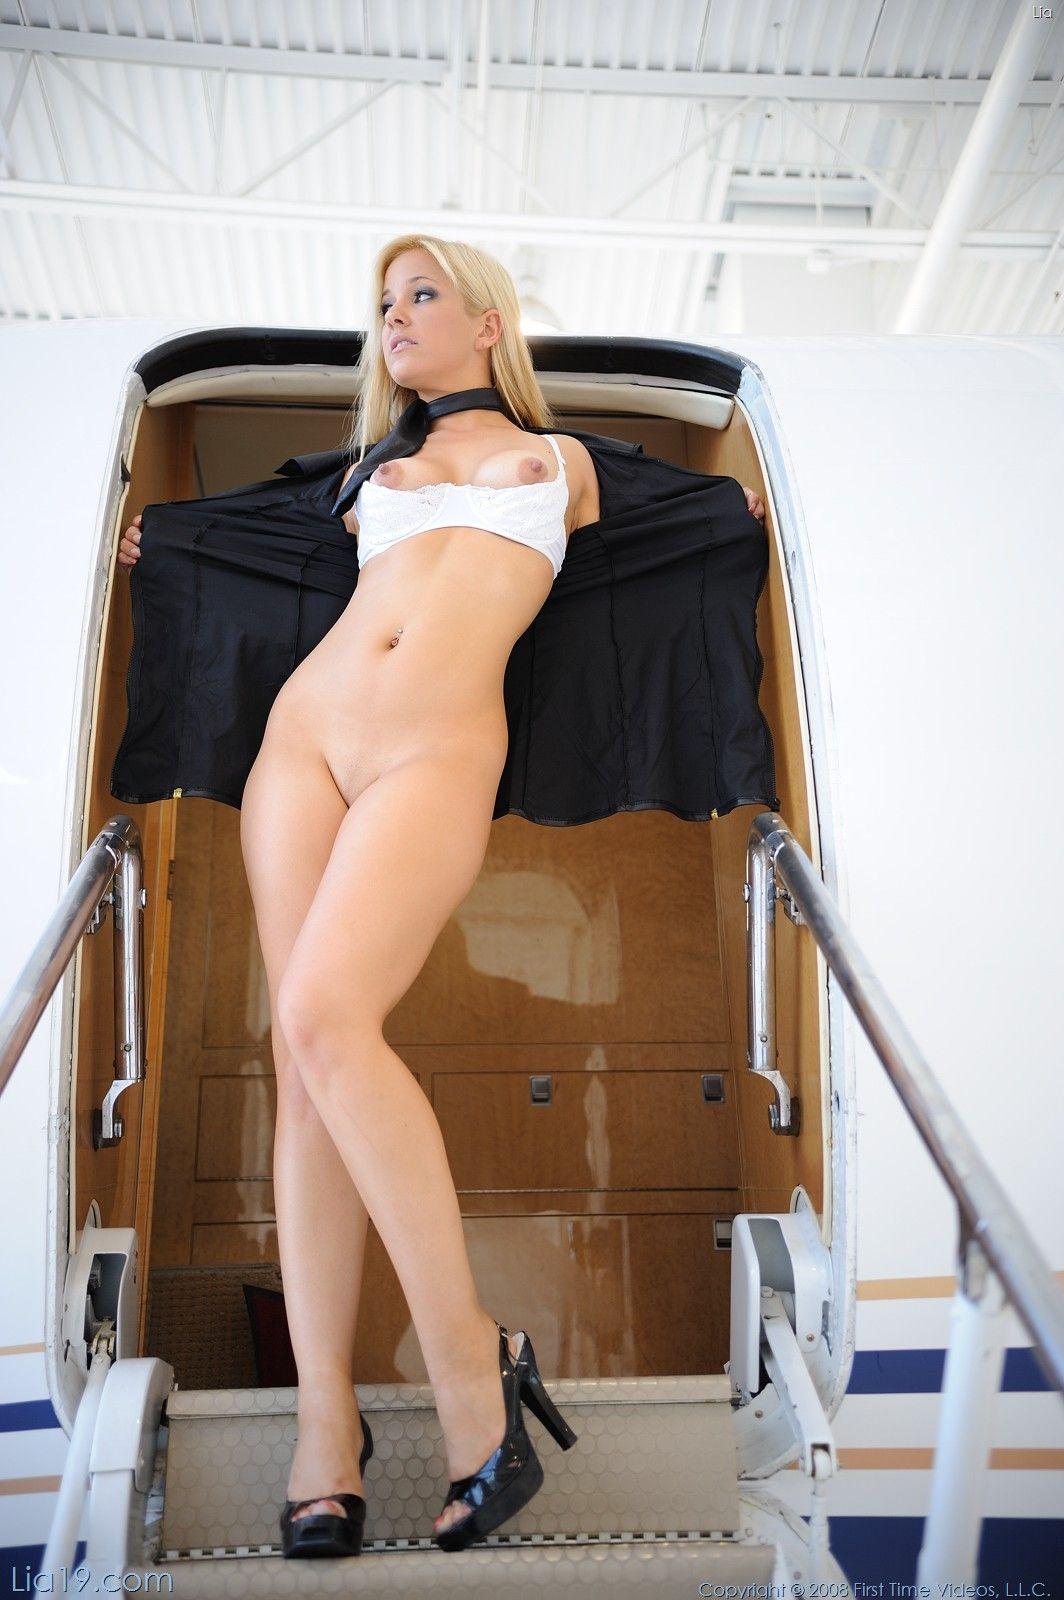 Hot sexy air hostess naked photos mumbai